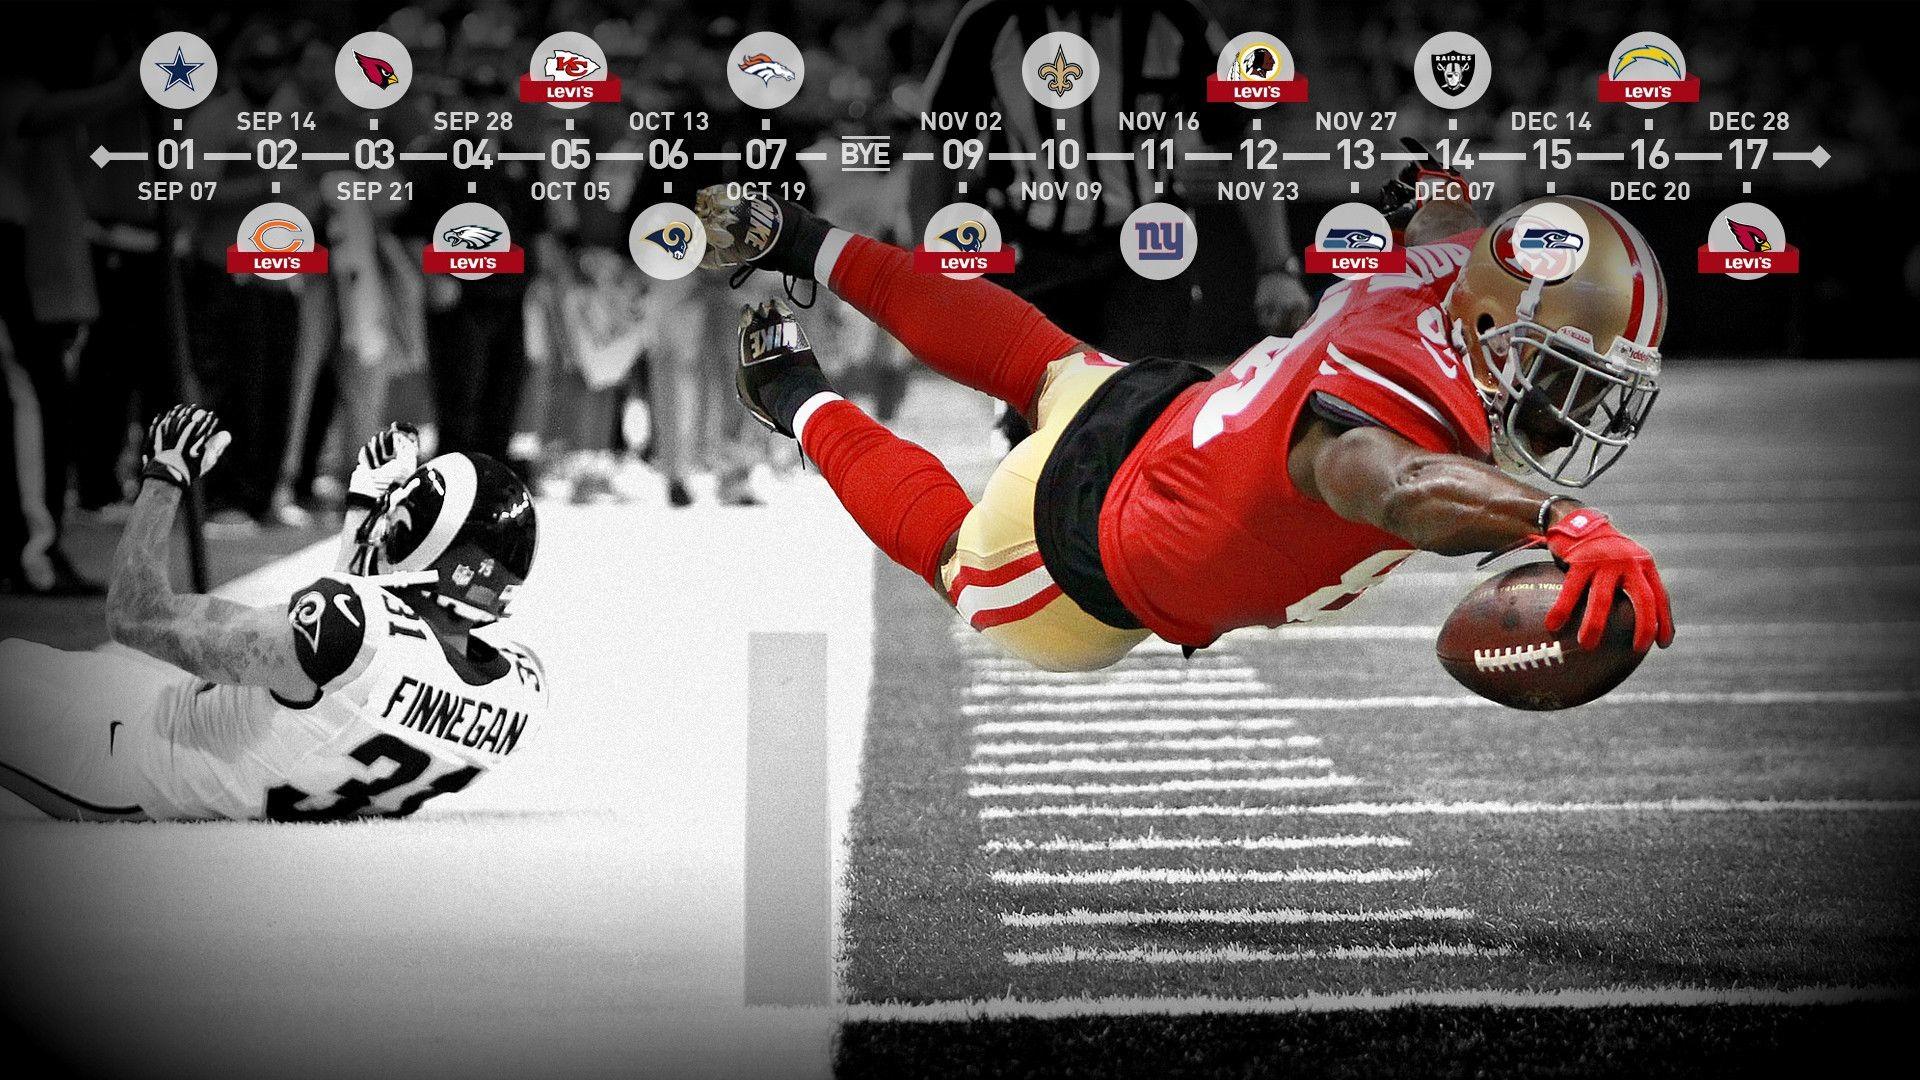 1920x1080 Sports - San Francisco 49ers Wallpaper